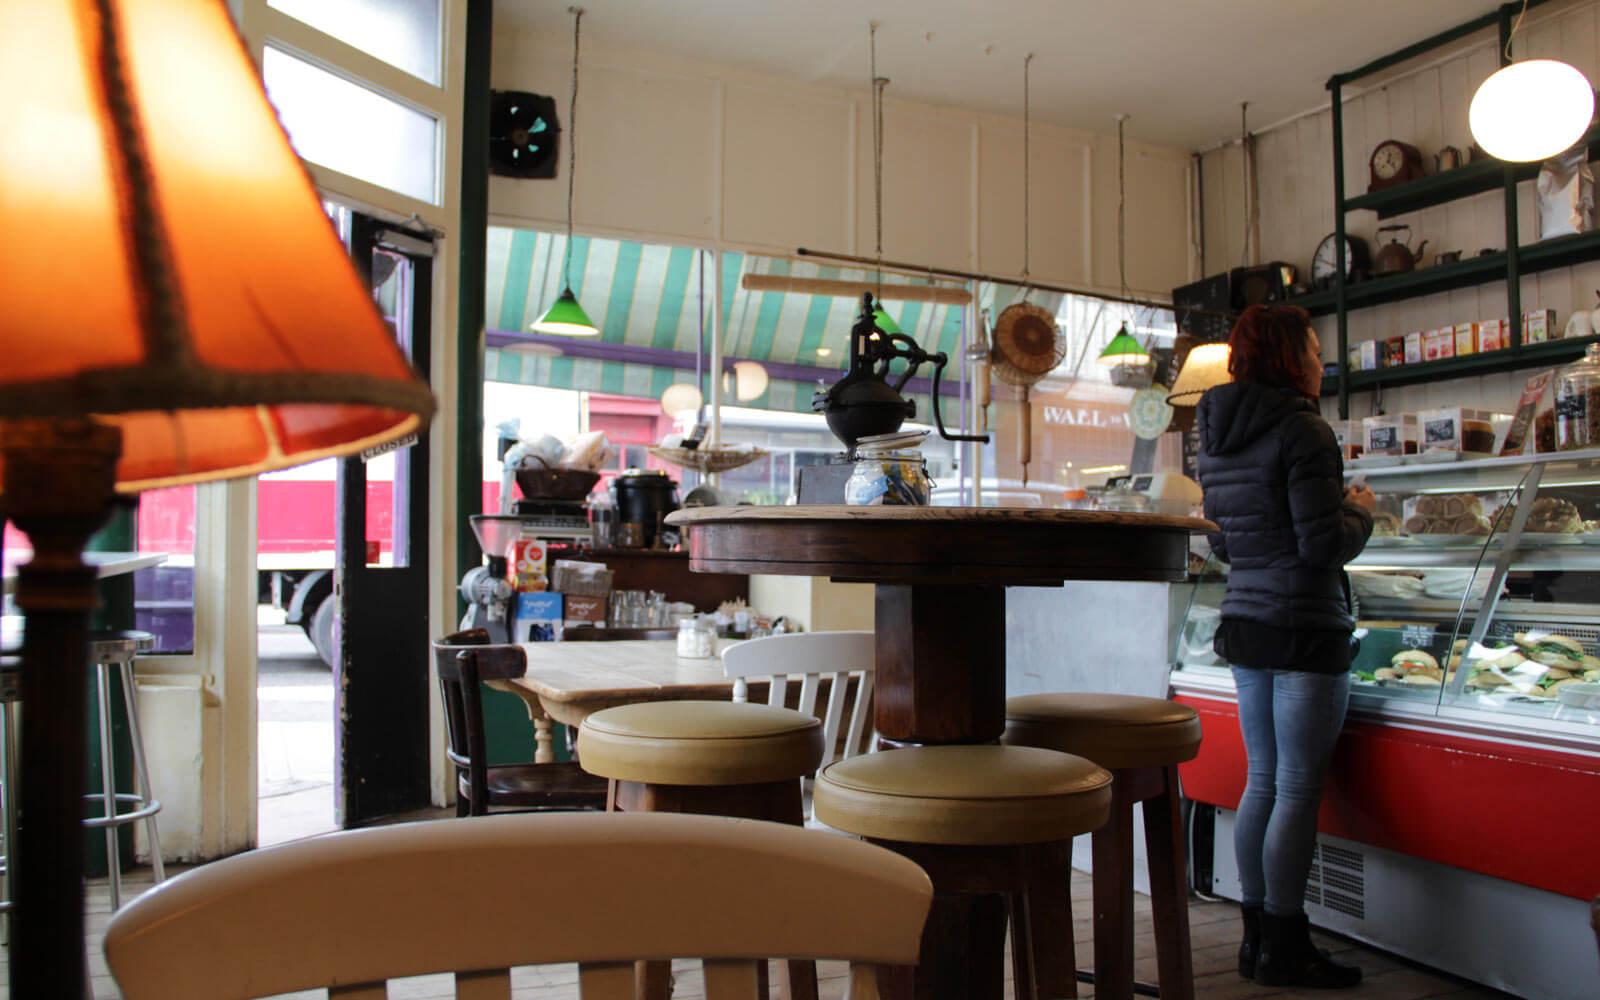 London Geheimtipps: Das »Il Molino« Café